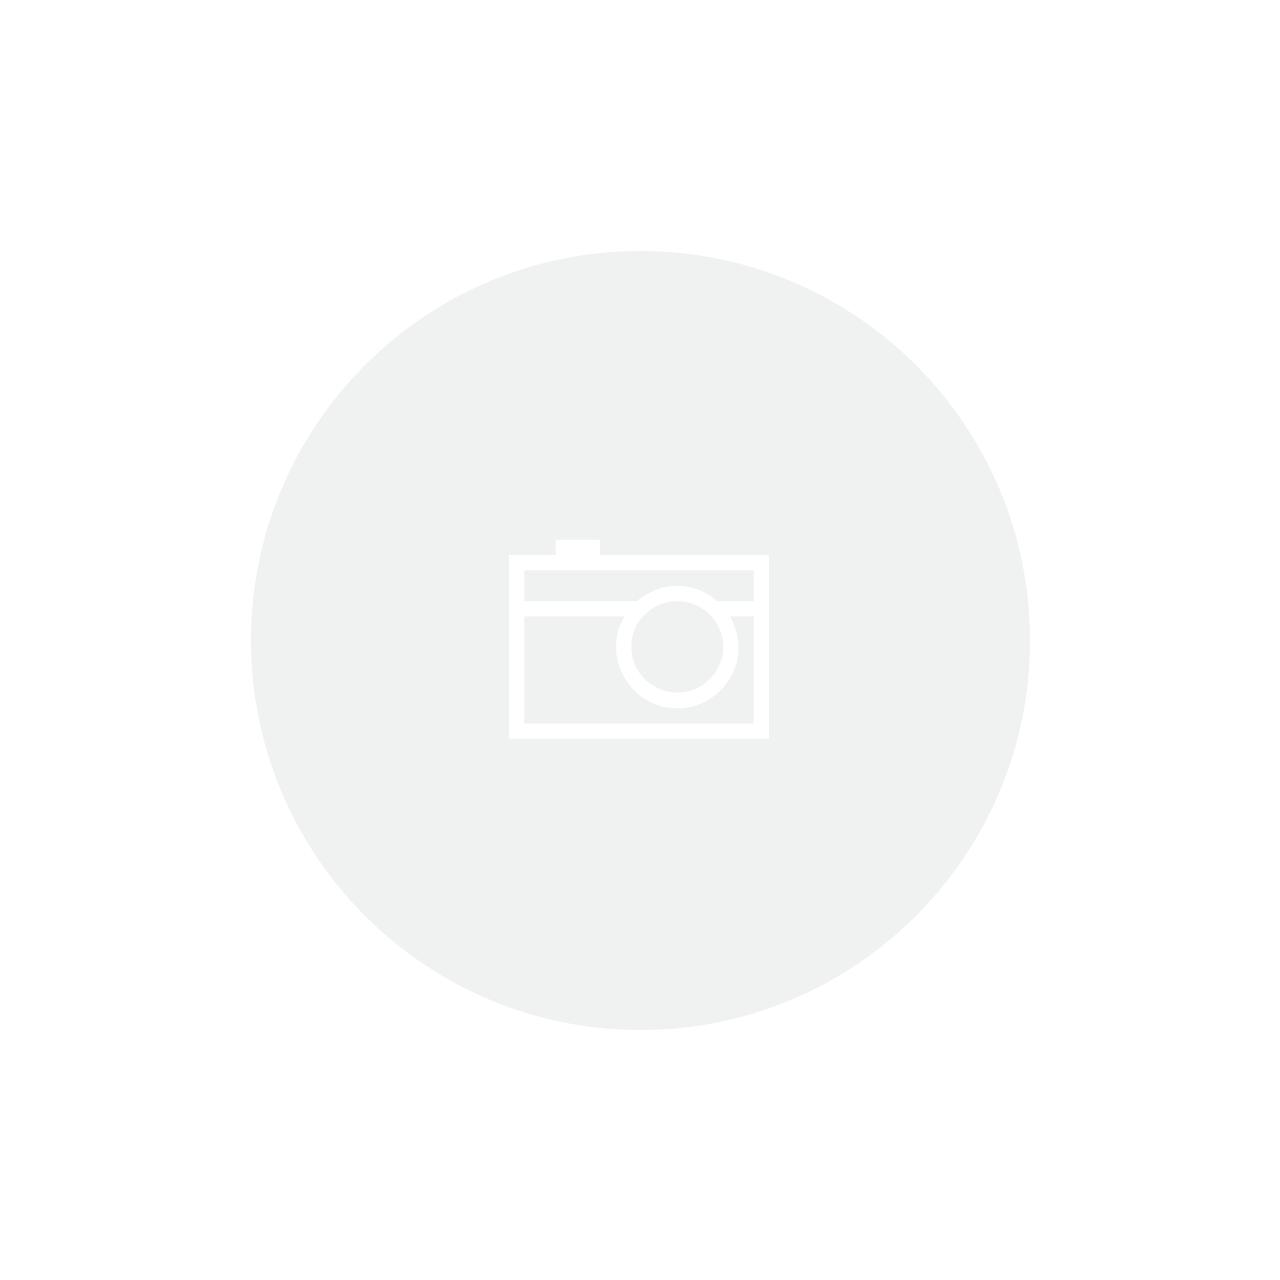 Papel Artesanal Indiano - Ref. 40